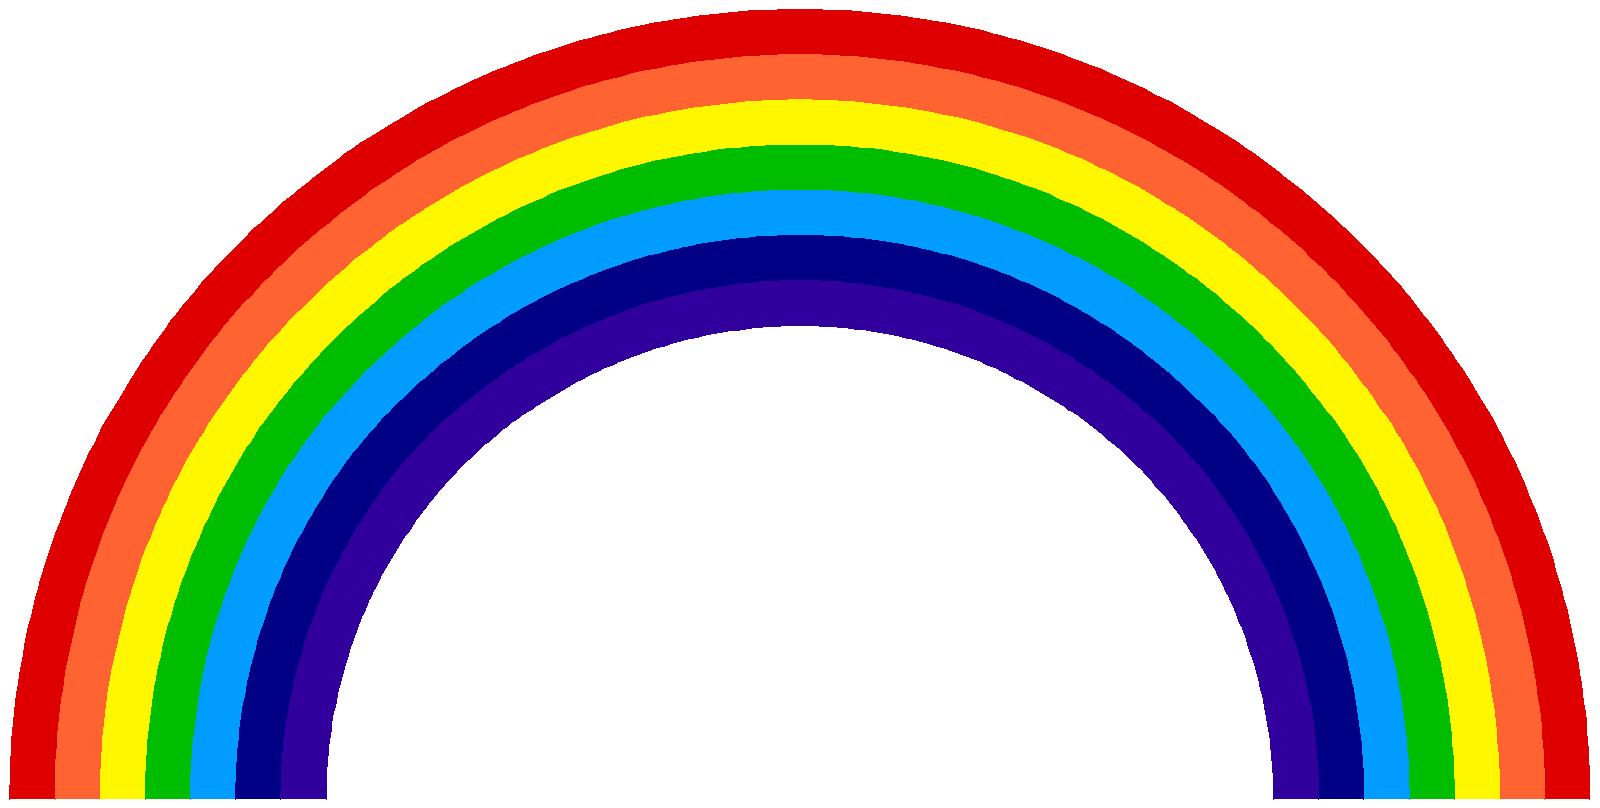 cartoon rainbow png clipart best St Patrick's Day Pot of Gold Clip Art Leprechaun Clip Art